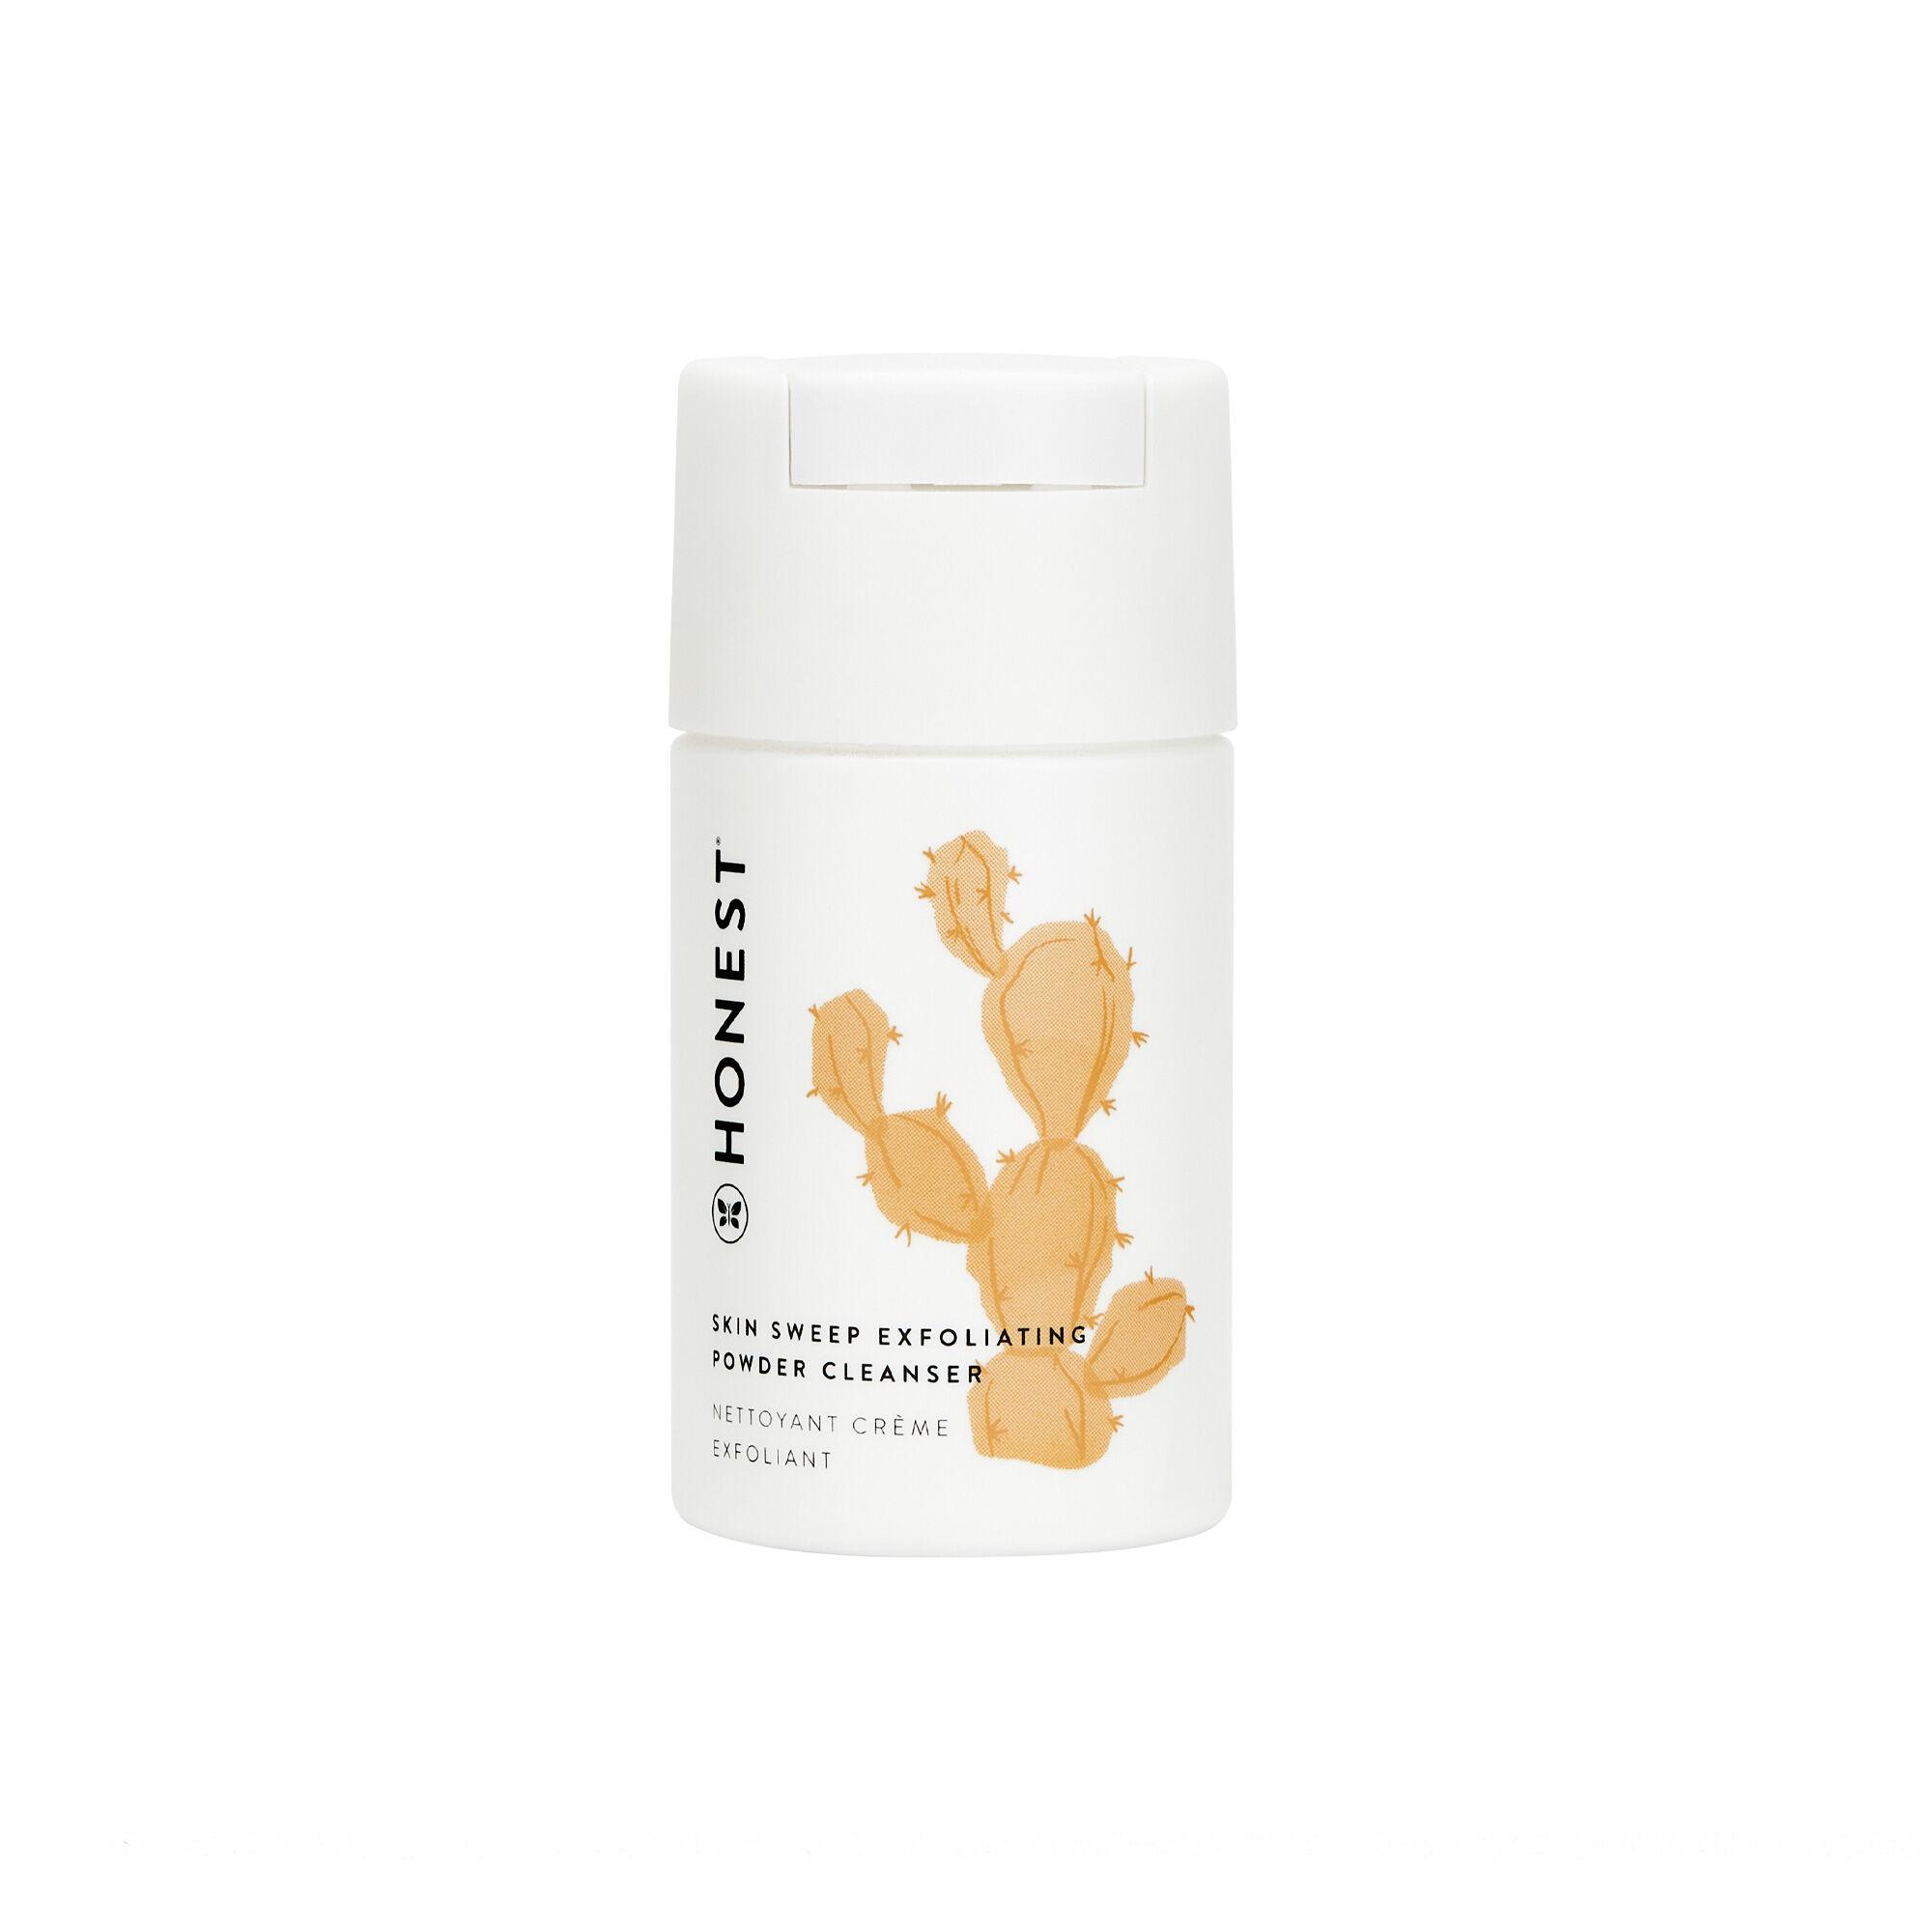 Skin Sweep Exfoliating Powder Cleanser